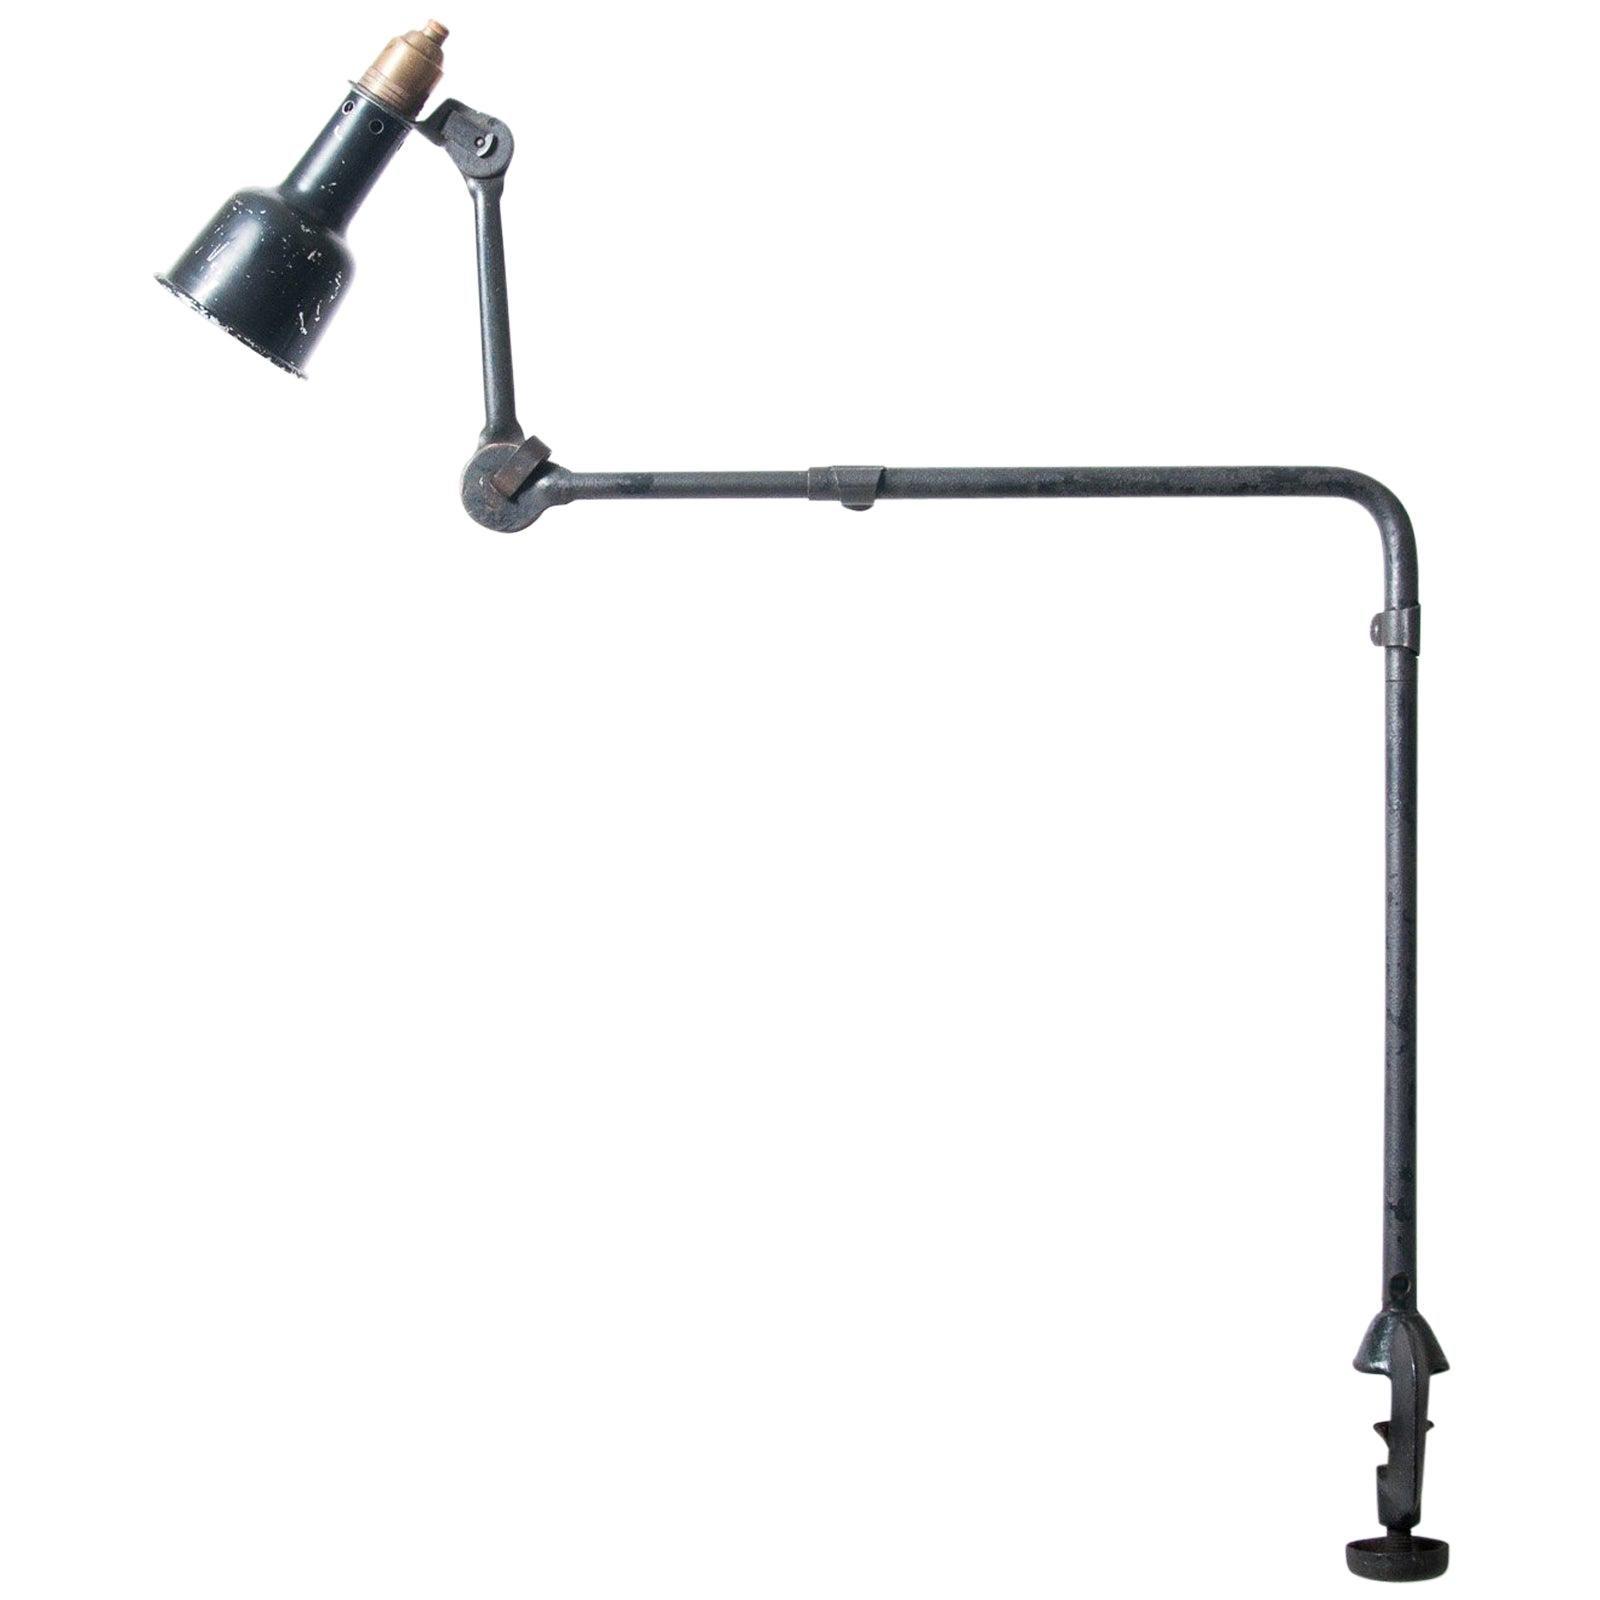 Gras Ravel '403 Model' Adjustable Table Lamp